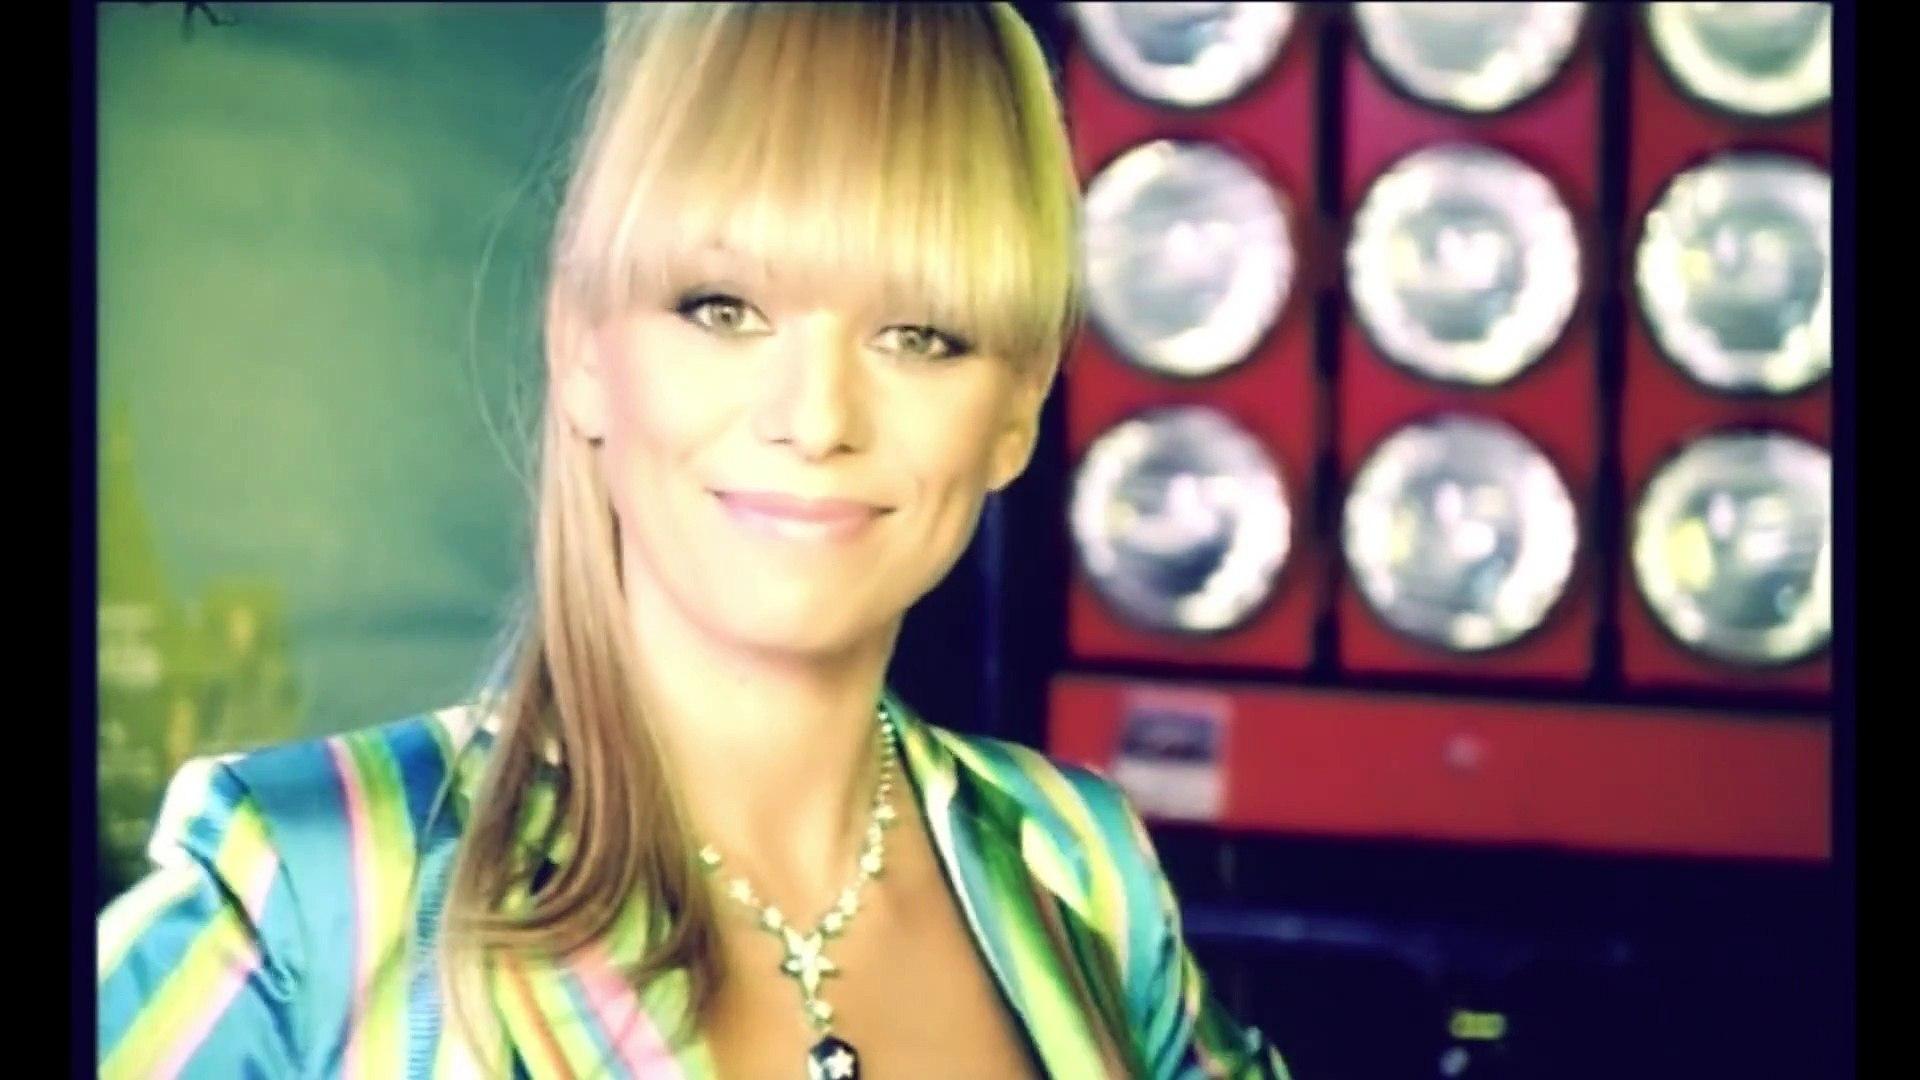 Ирина Салтыкова - Мадонна / Irina Saltykova - Madonna (клип)